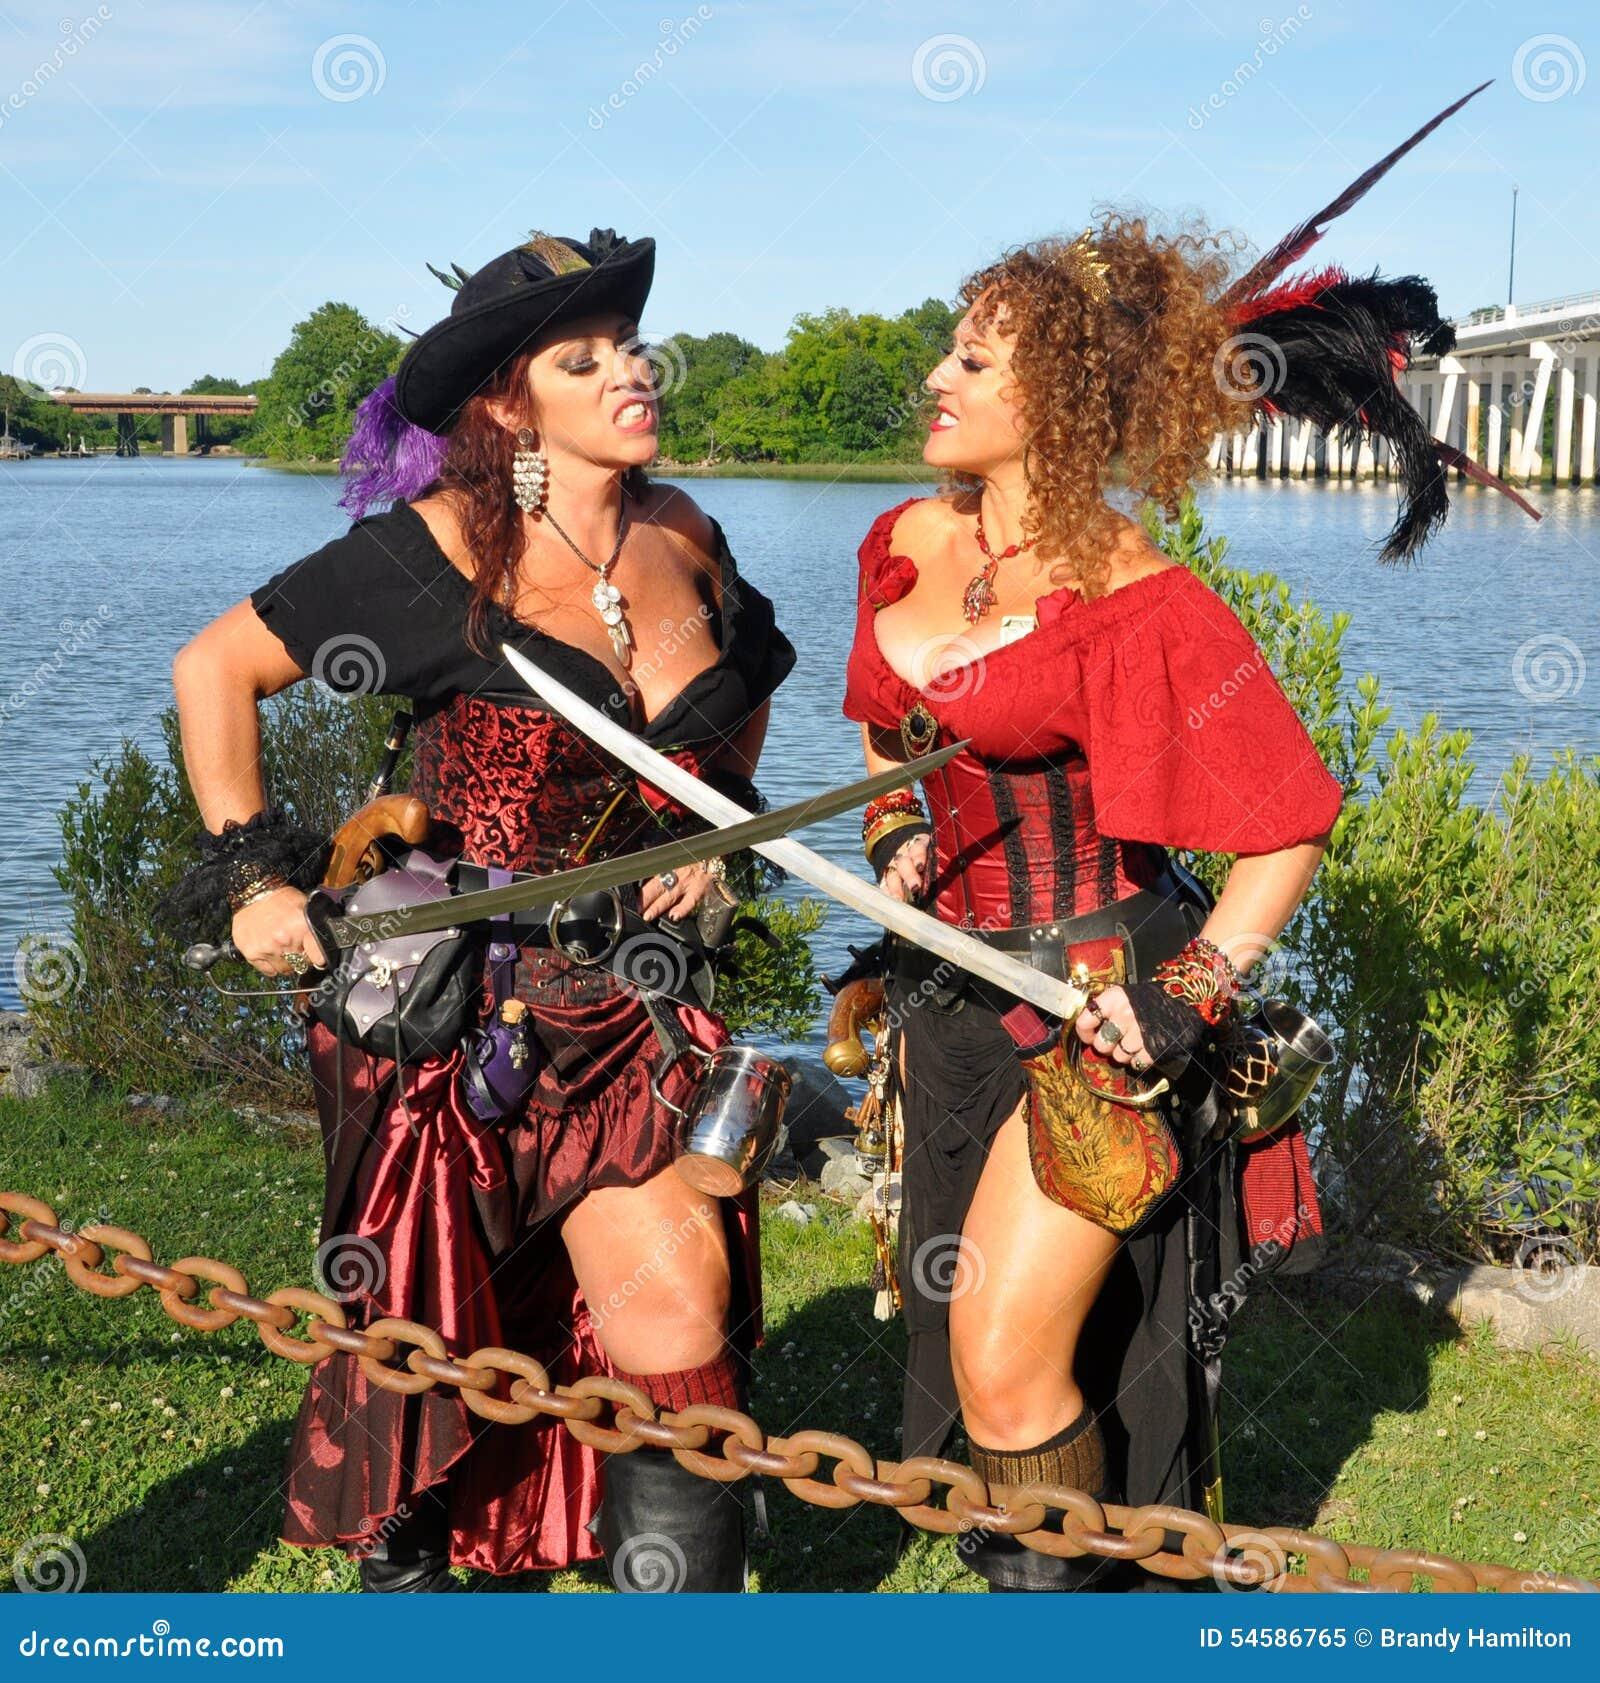 ... other.Image taken at annual Blackbeard Pirate Festival in Hampton, Va